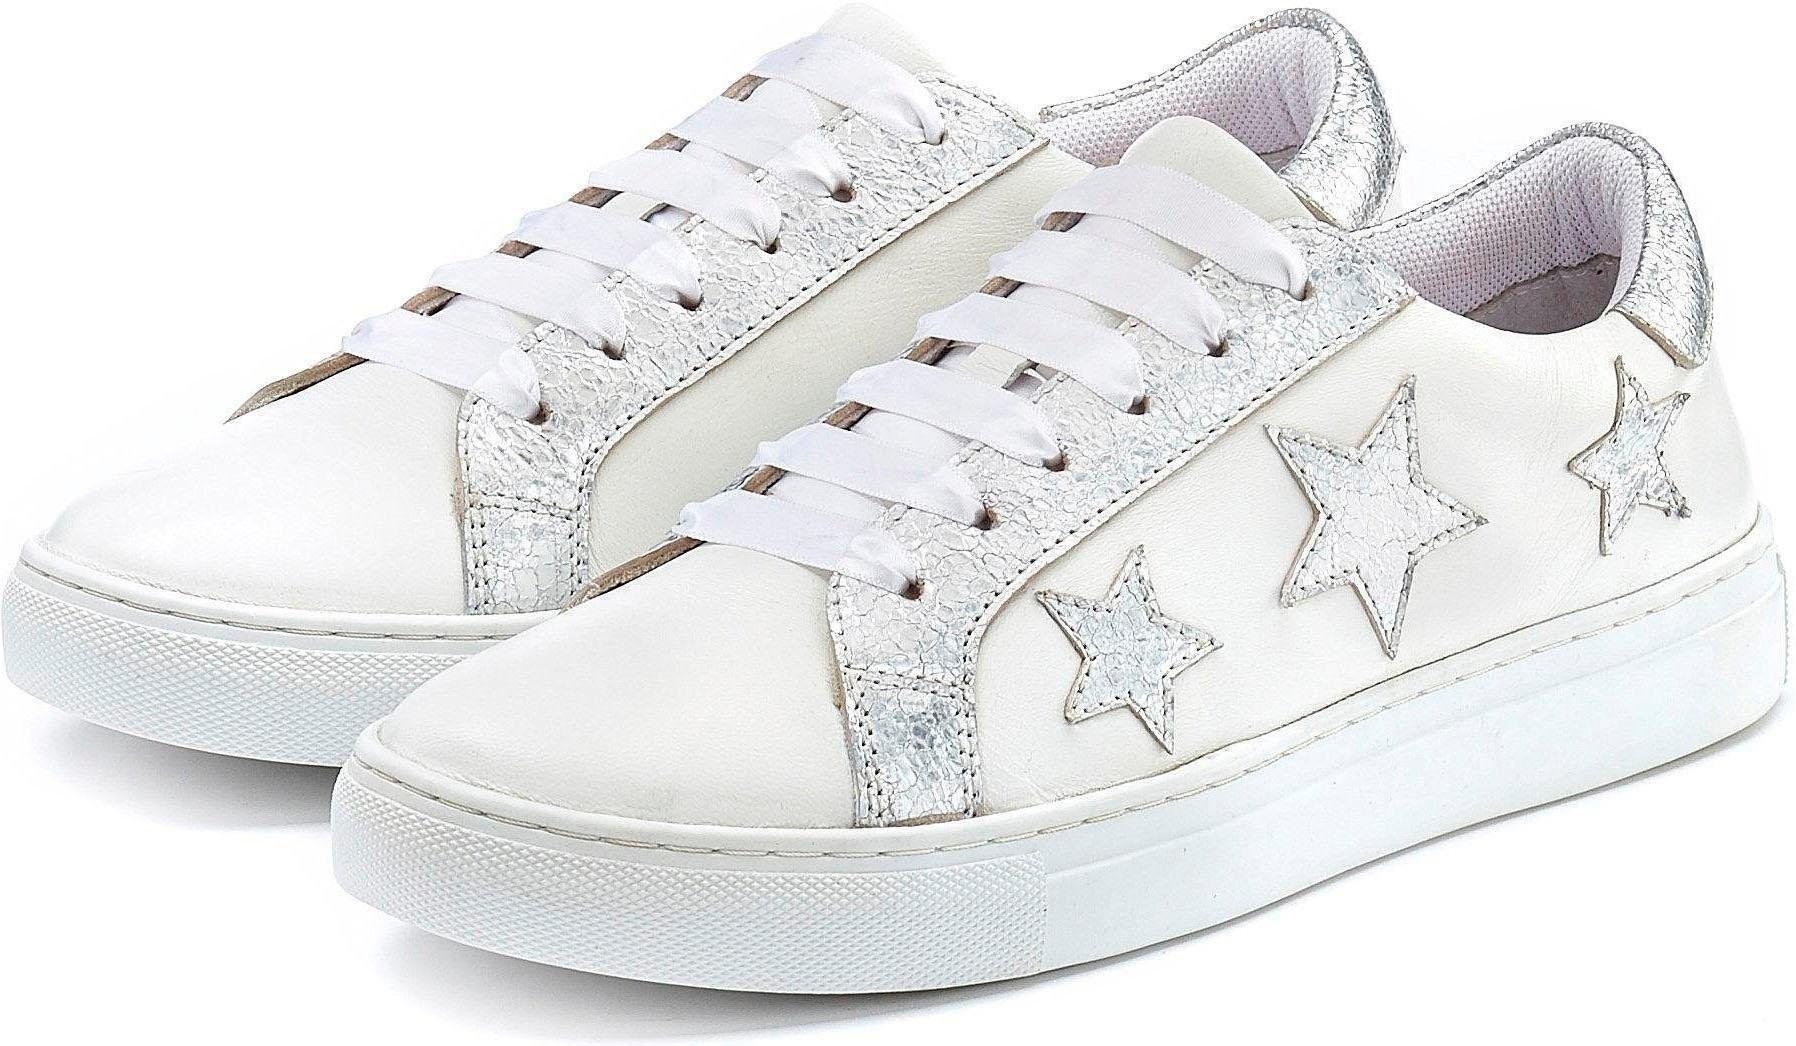 LASCANA sneakers nu online bestellen